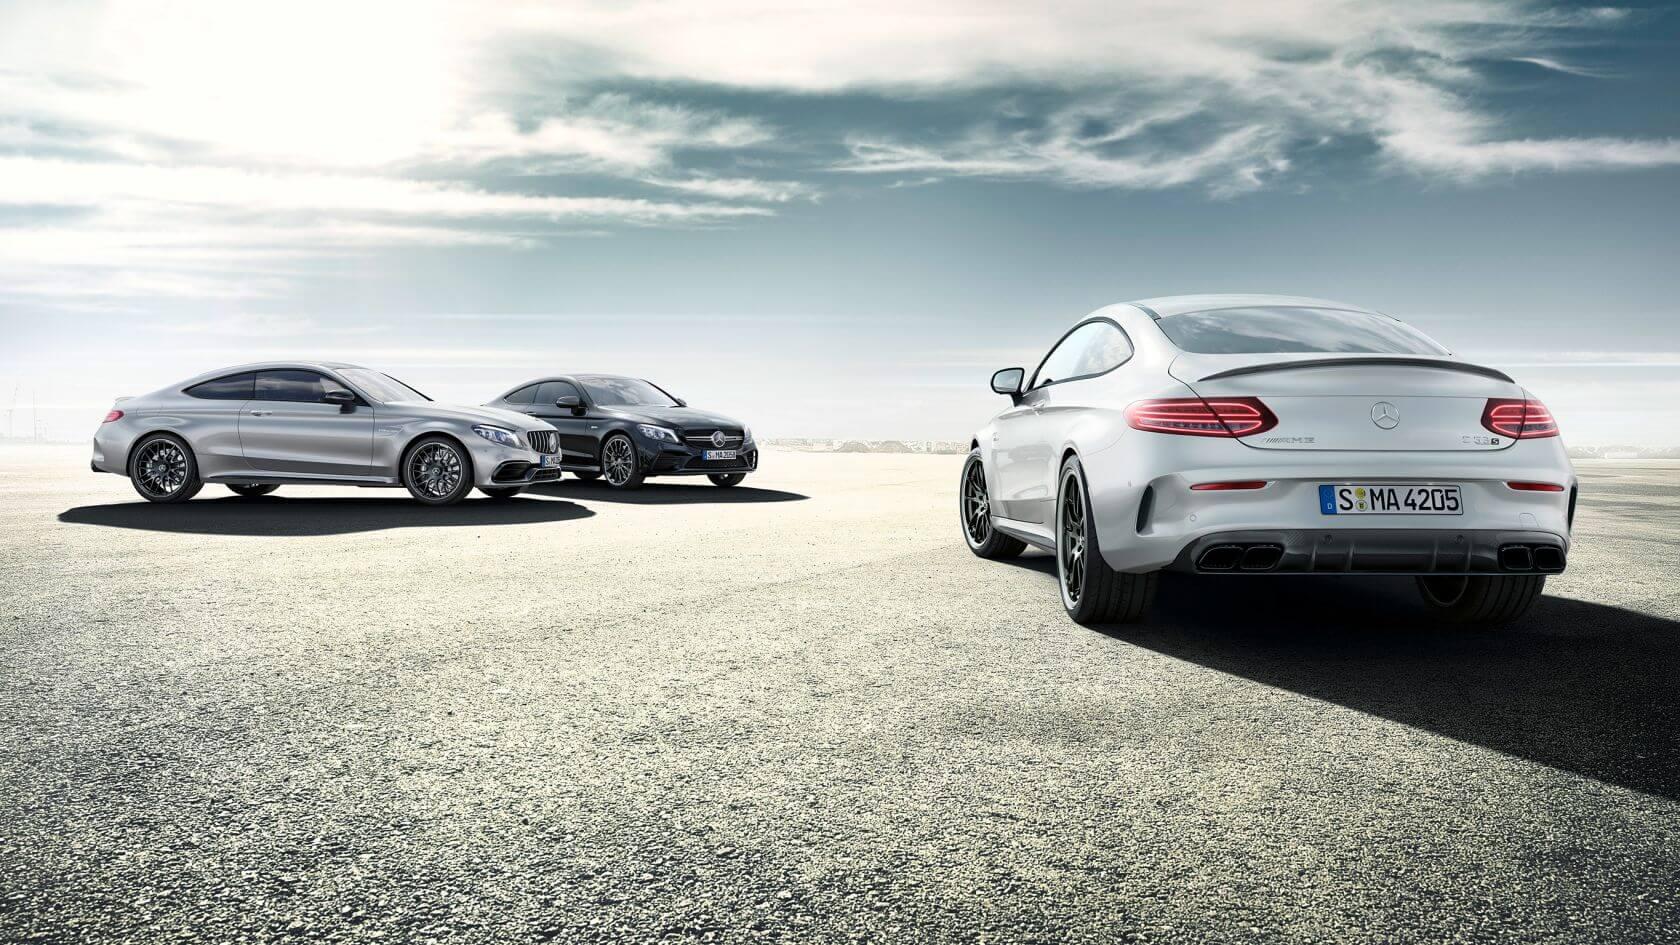 Mercedes C-Class cars